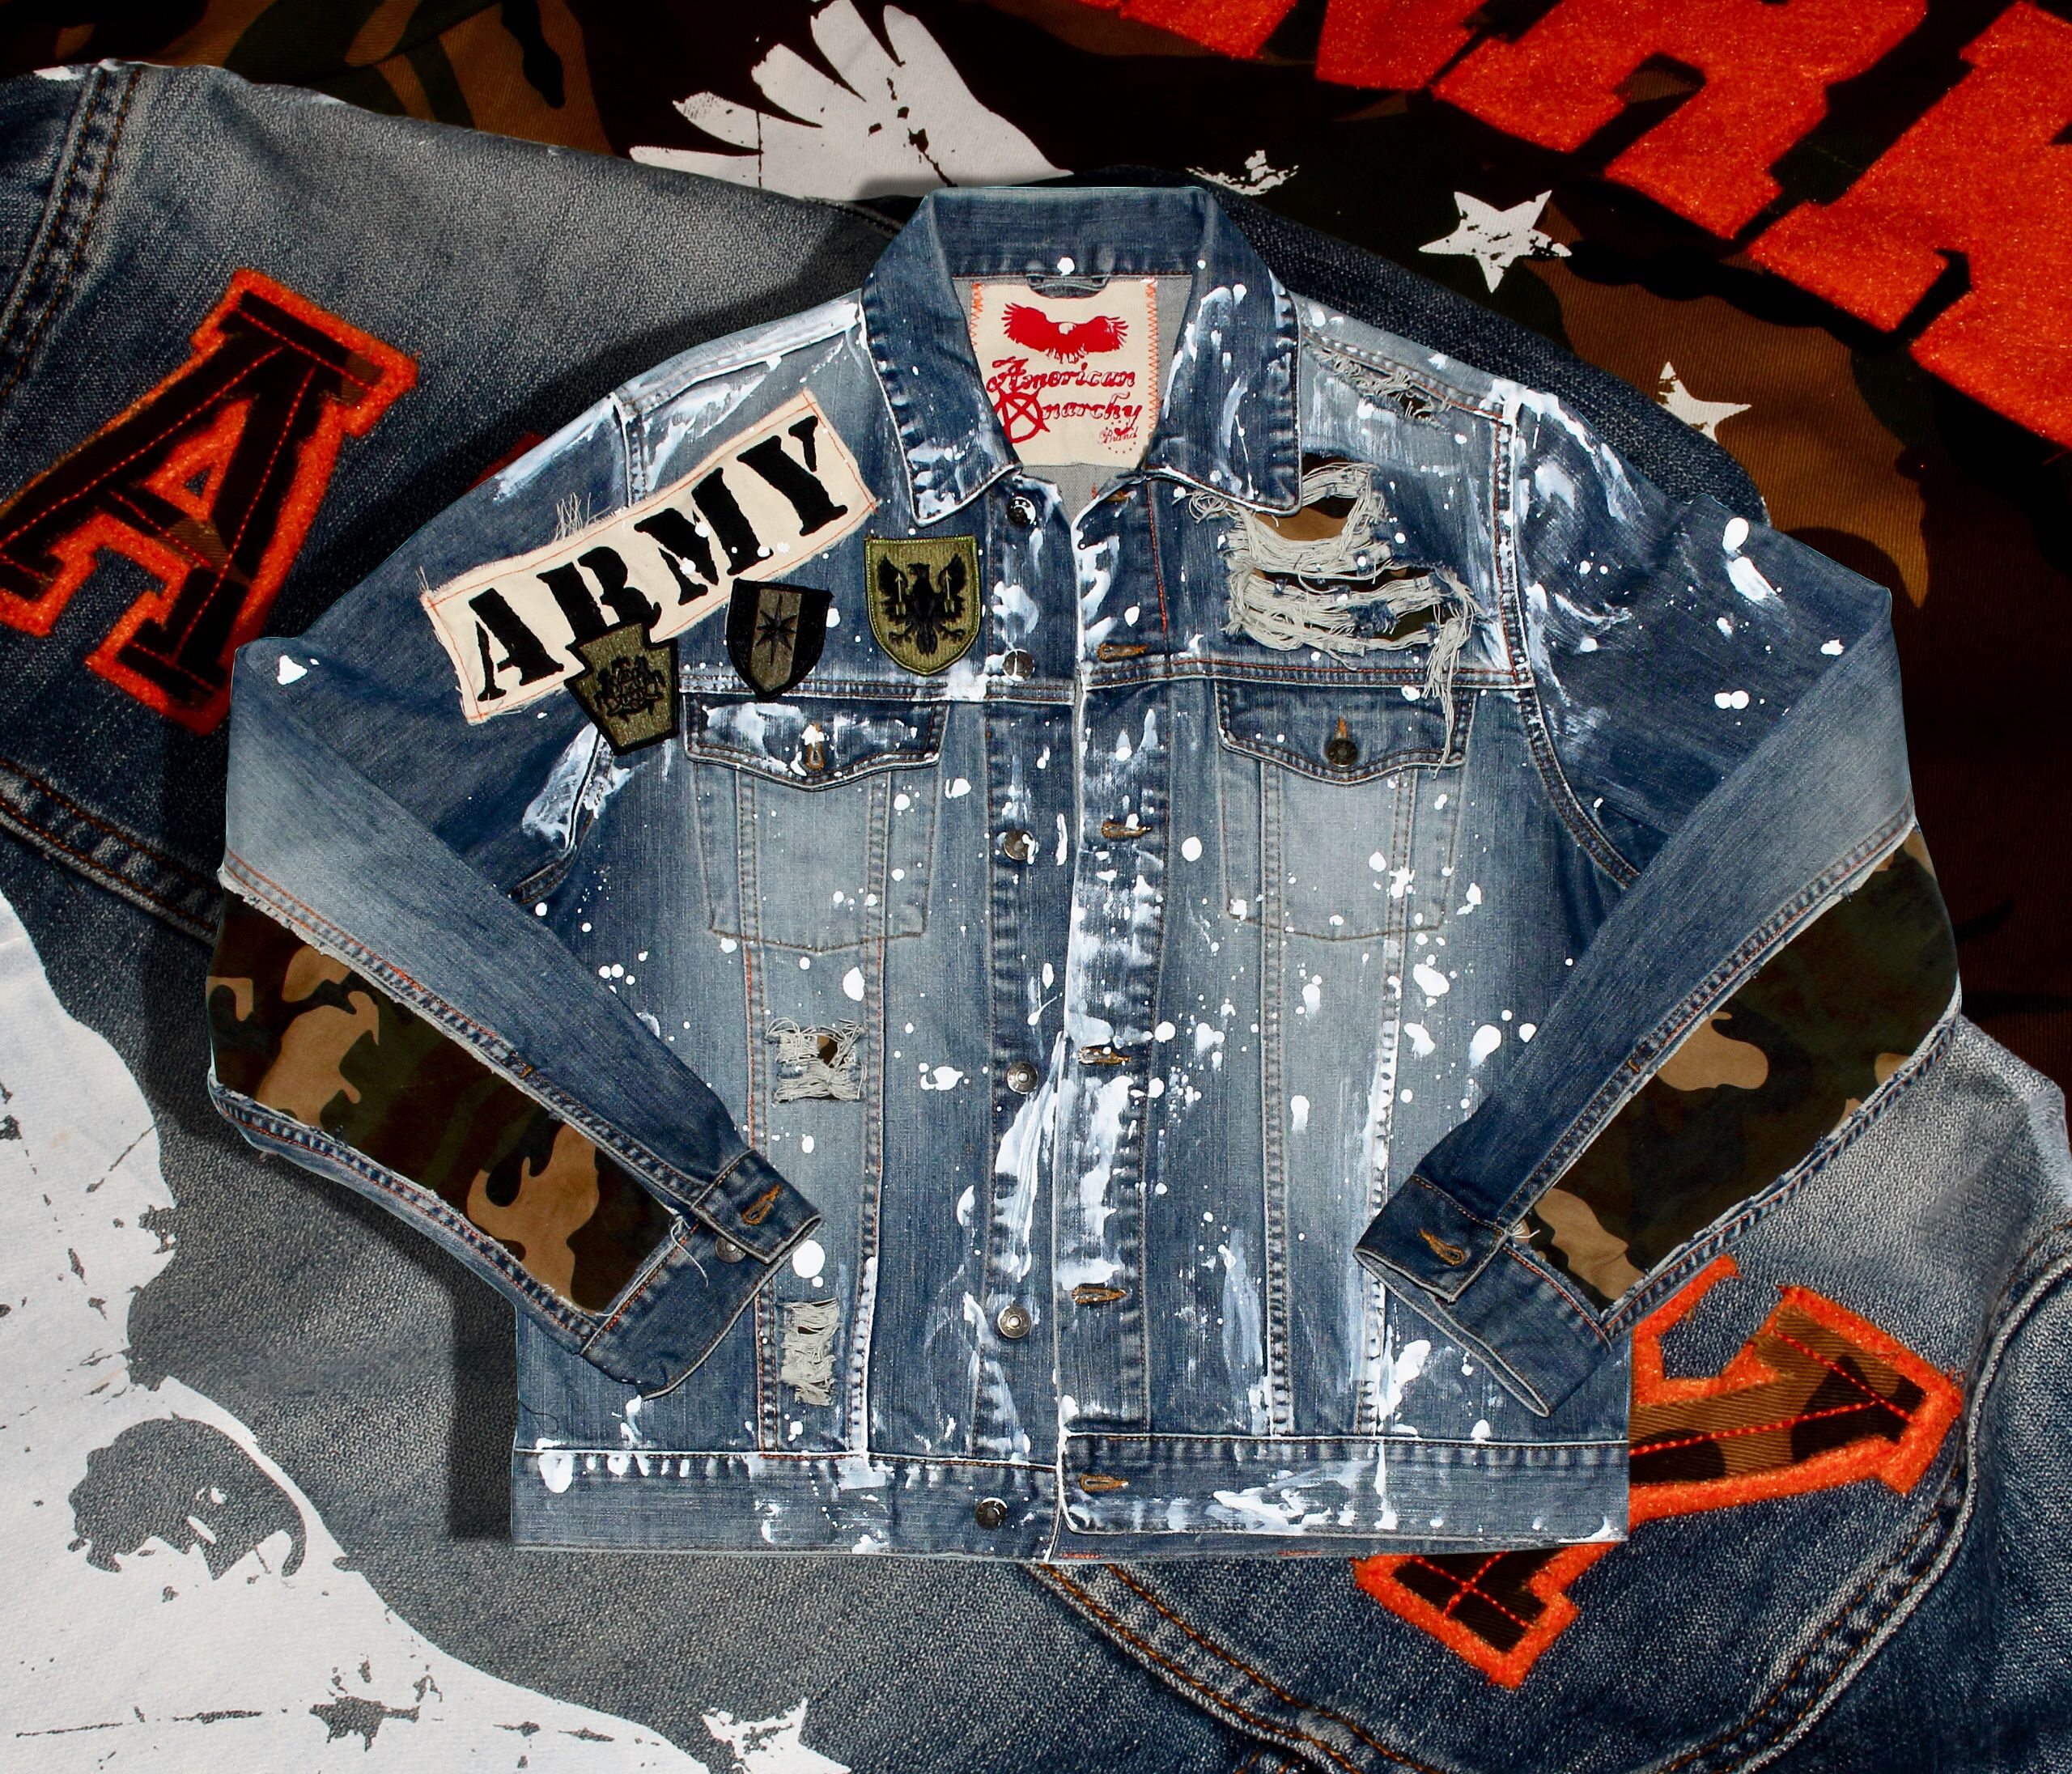 Custom Denim Jacket Distressed Paint Splatter Denim By Anrky Brand Camo Sleeve Edition Denim Jacket Distressed Denim Jacket Jackets [ 2192 x 2560 Pixel ]